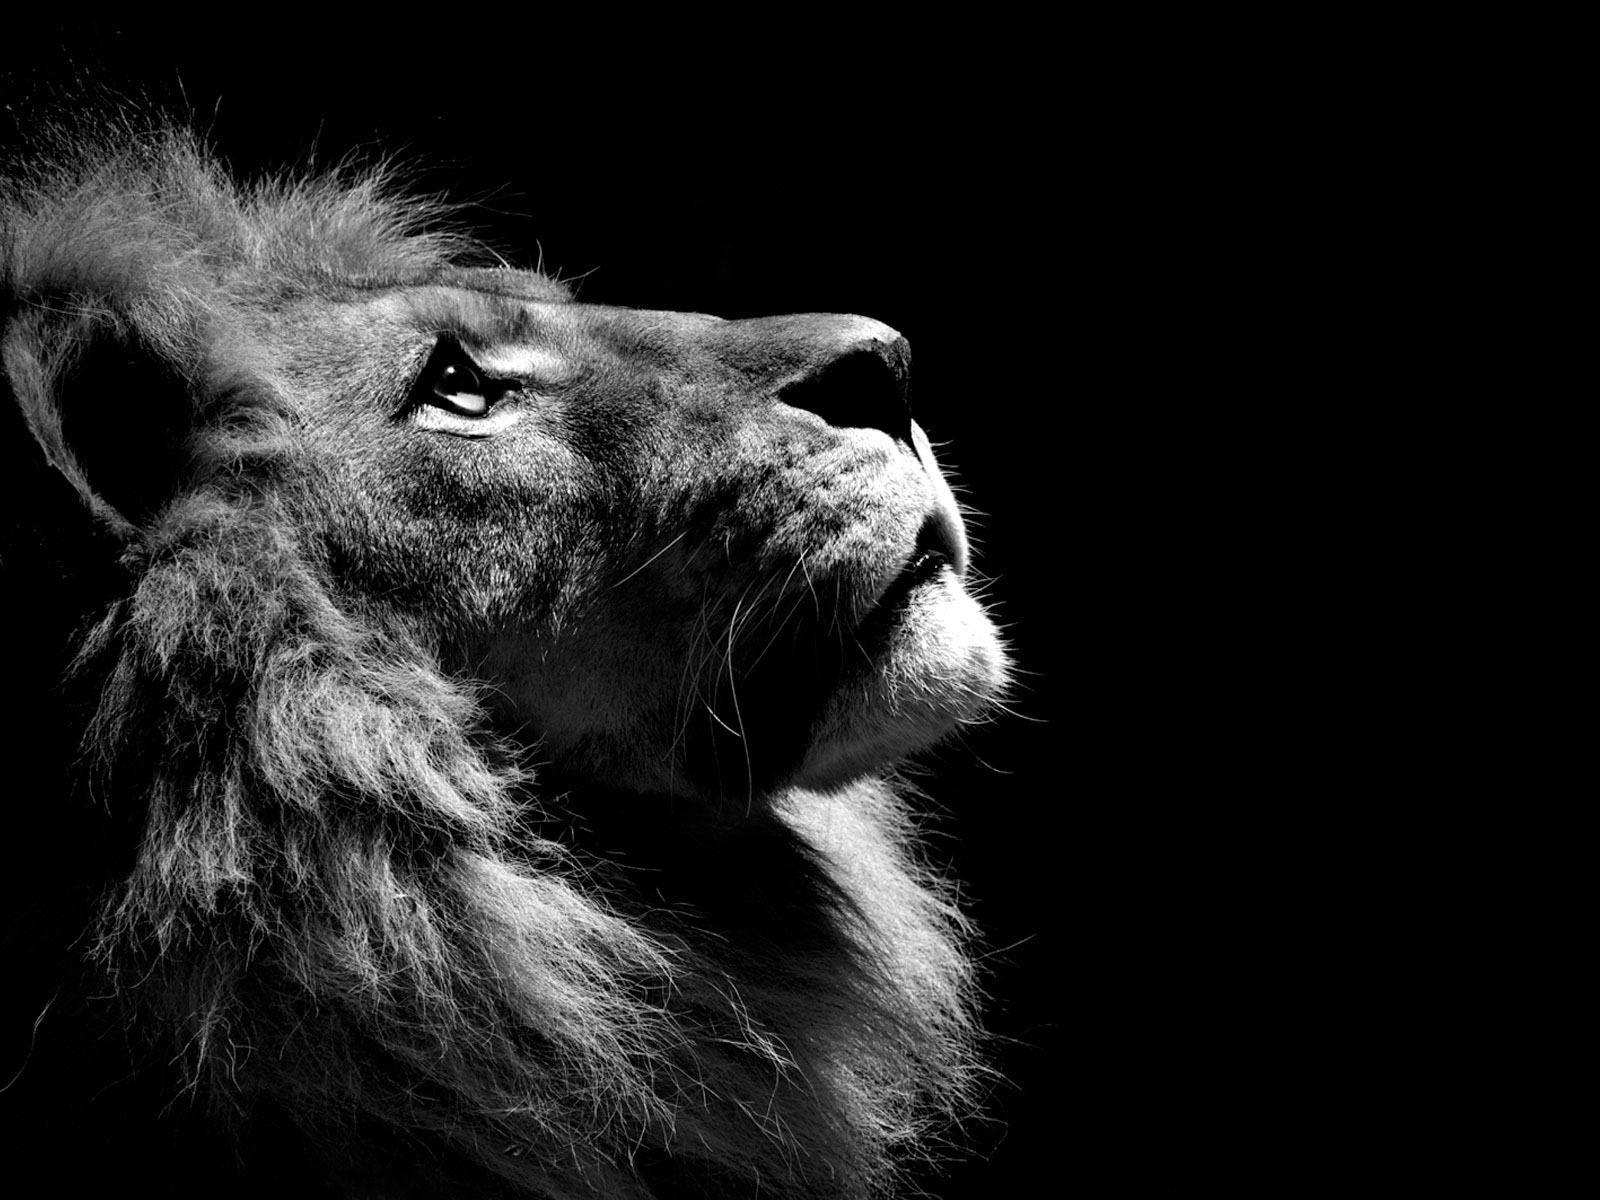 Black Lion Animal Bing Images Black And White Lion Lion Profile Lion Wallpaper